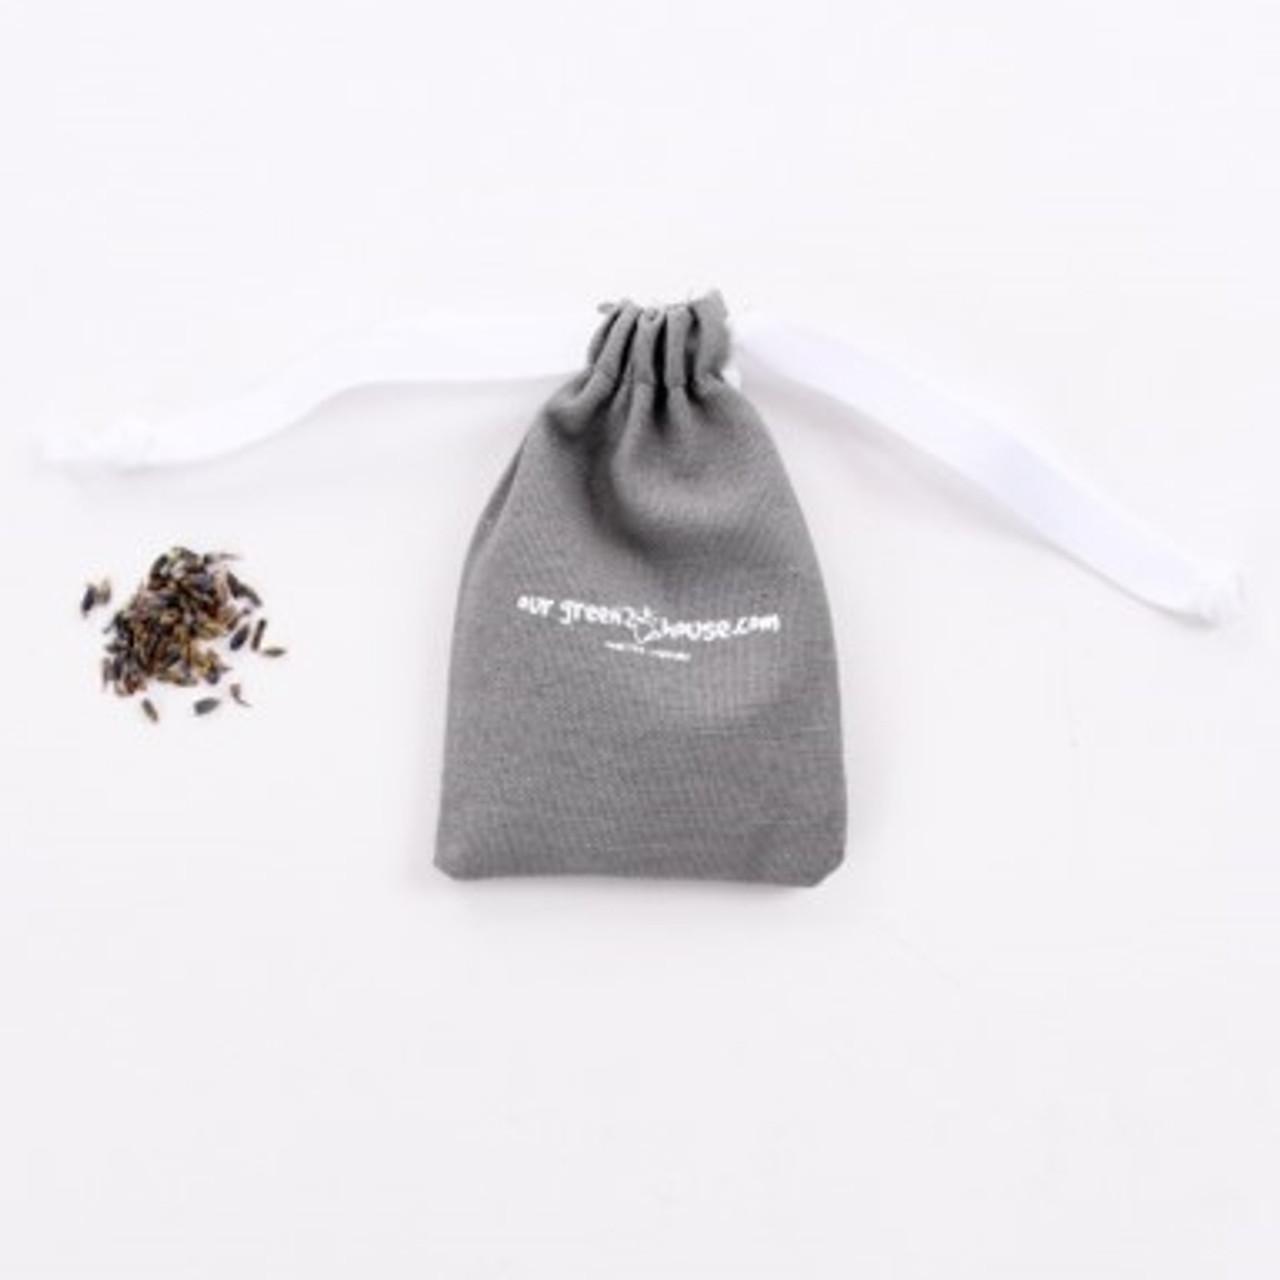 Lavender Sachet - Organic